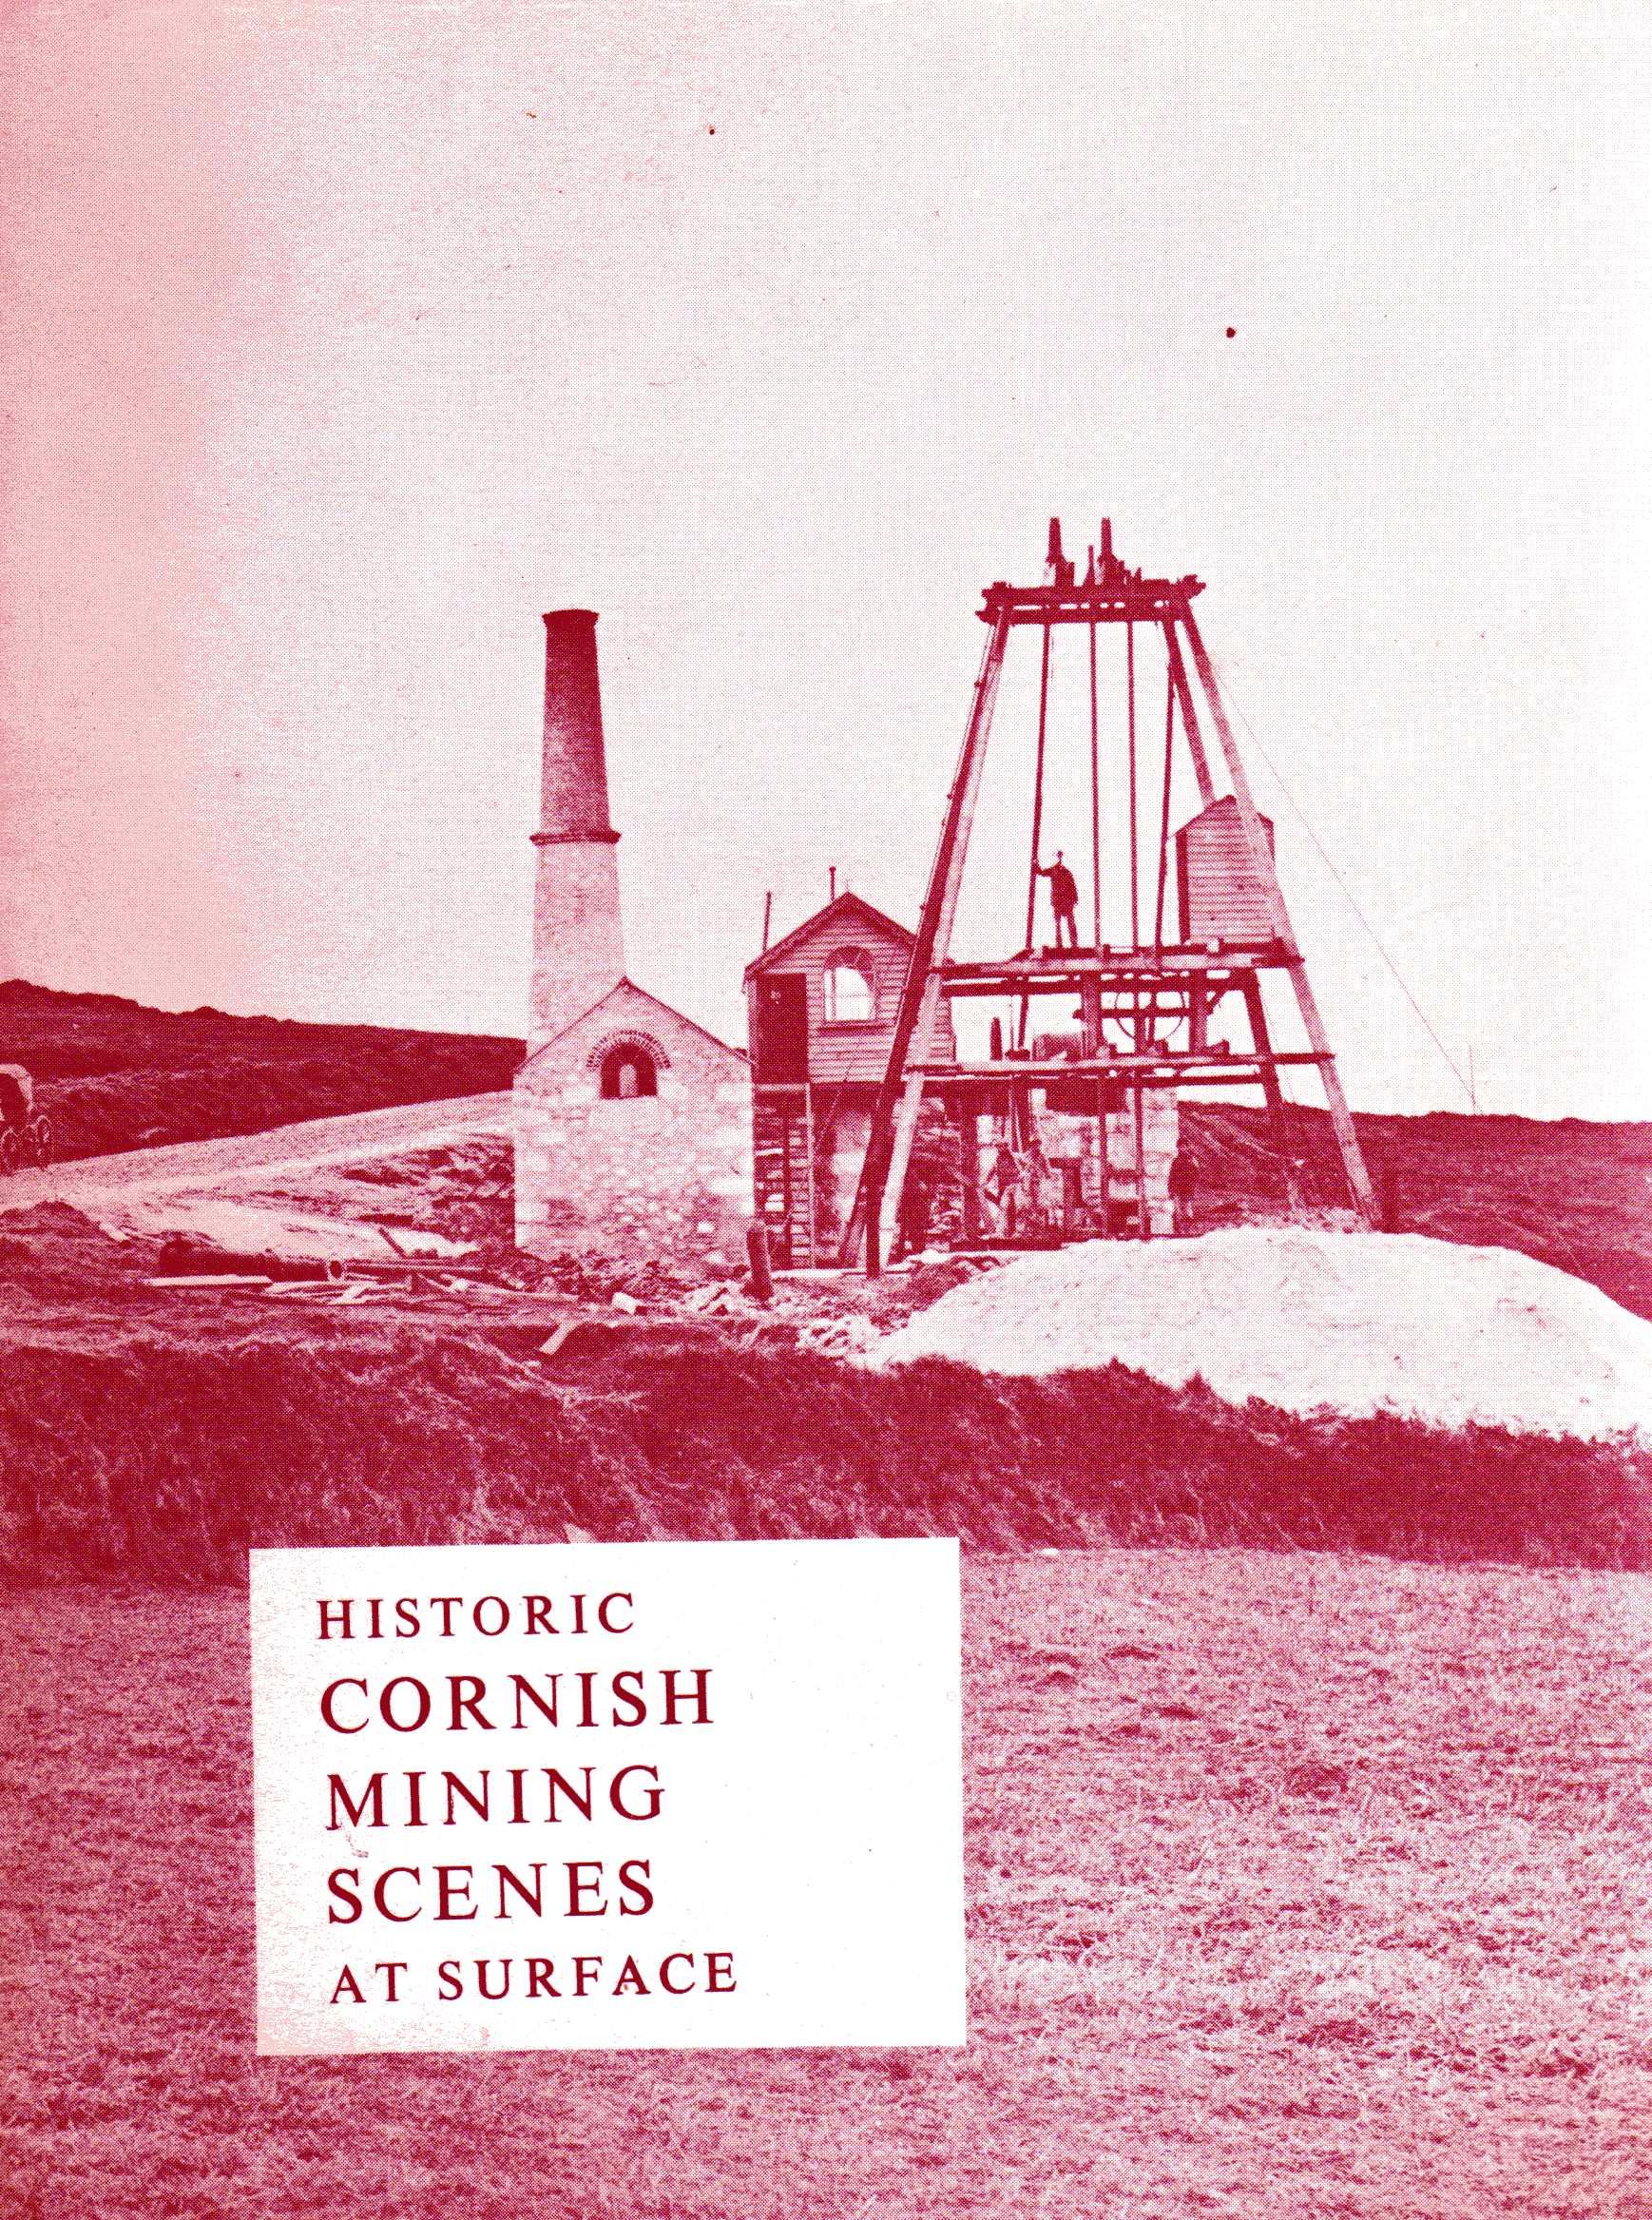 [USED] Historic Cornish Mining Scenes at Surface